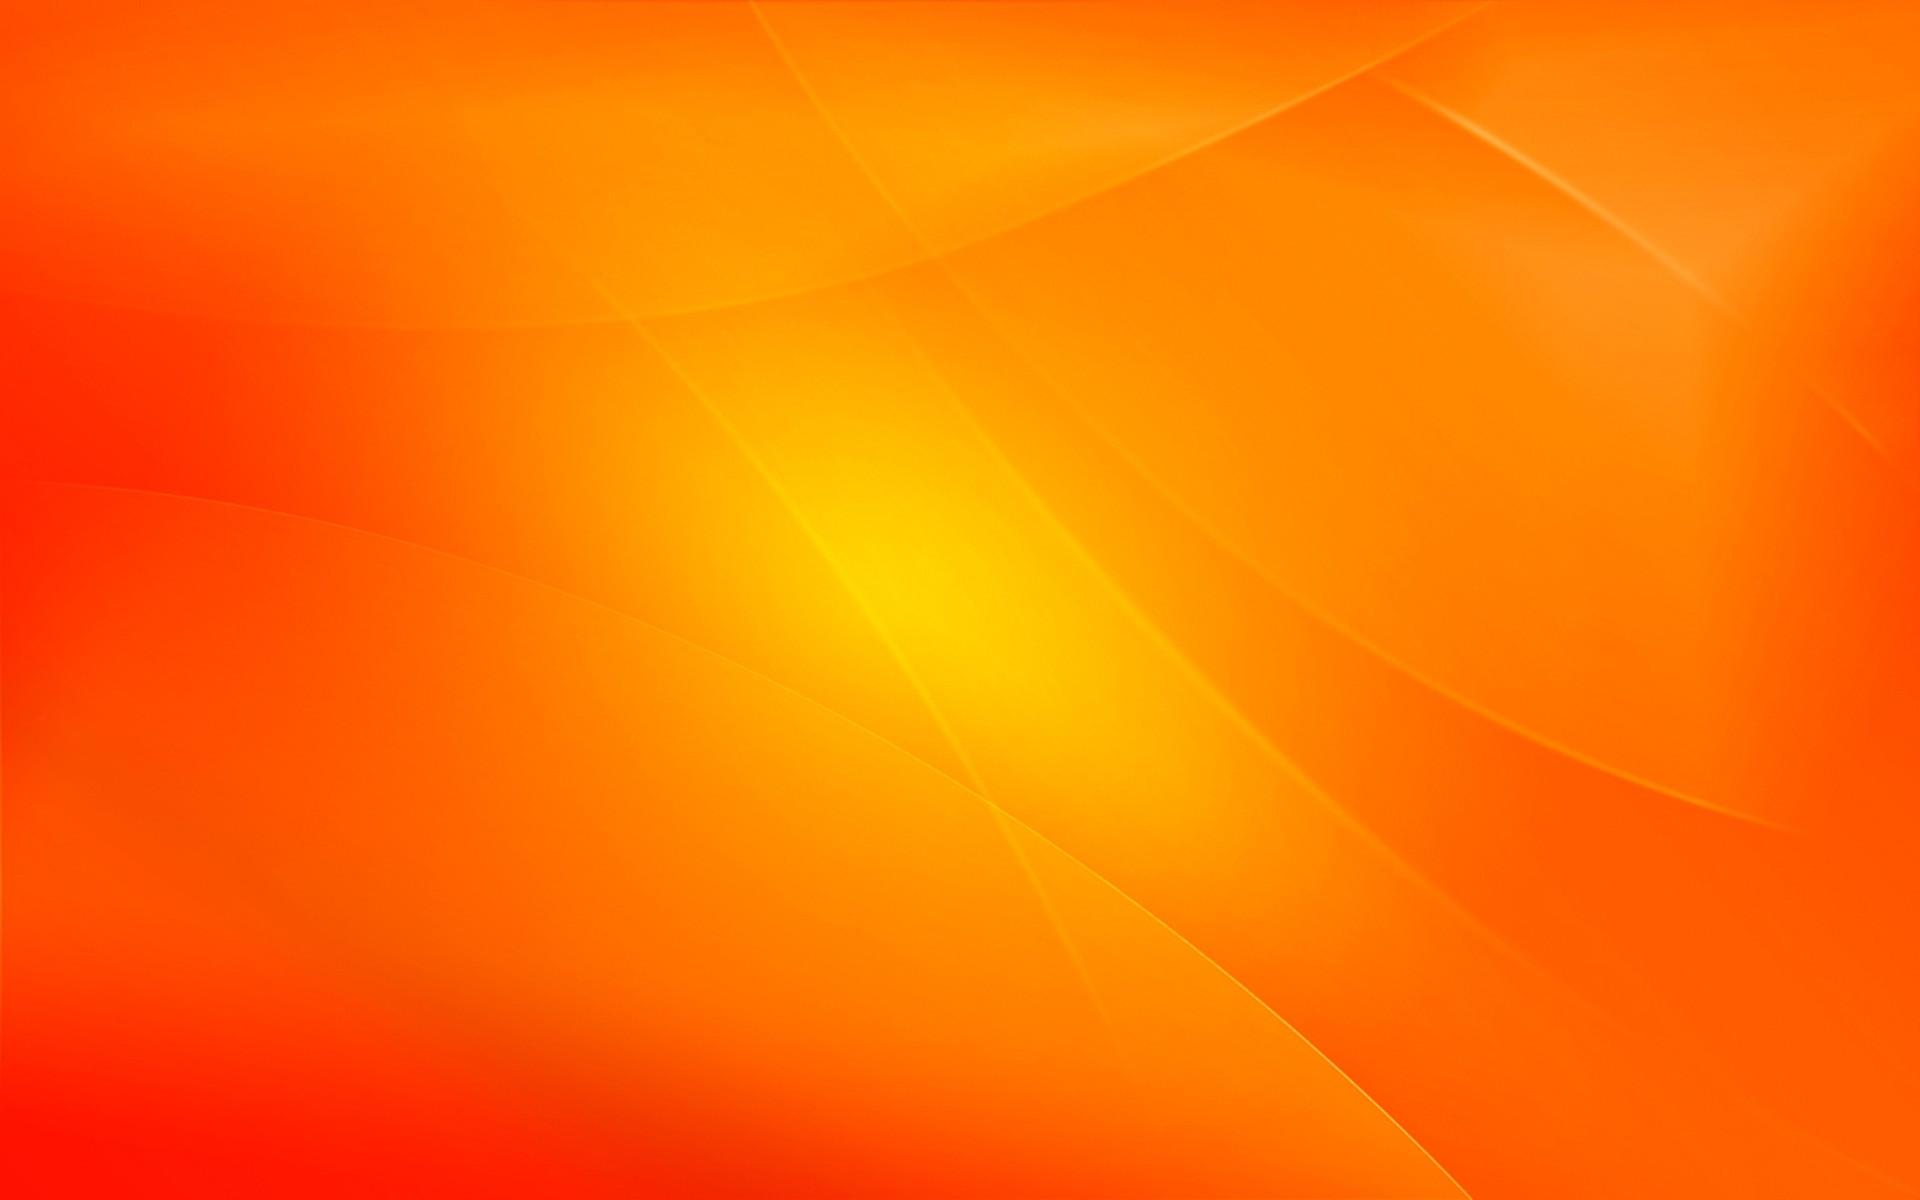 orange wallpaper 864126 orange wallpaper 864149 orange flower 1920x1200